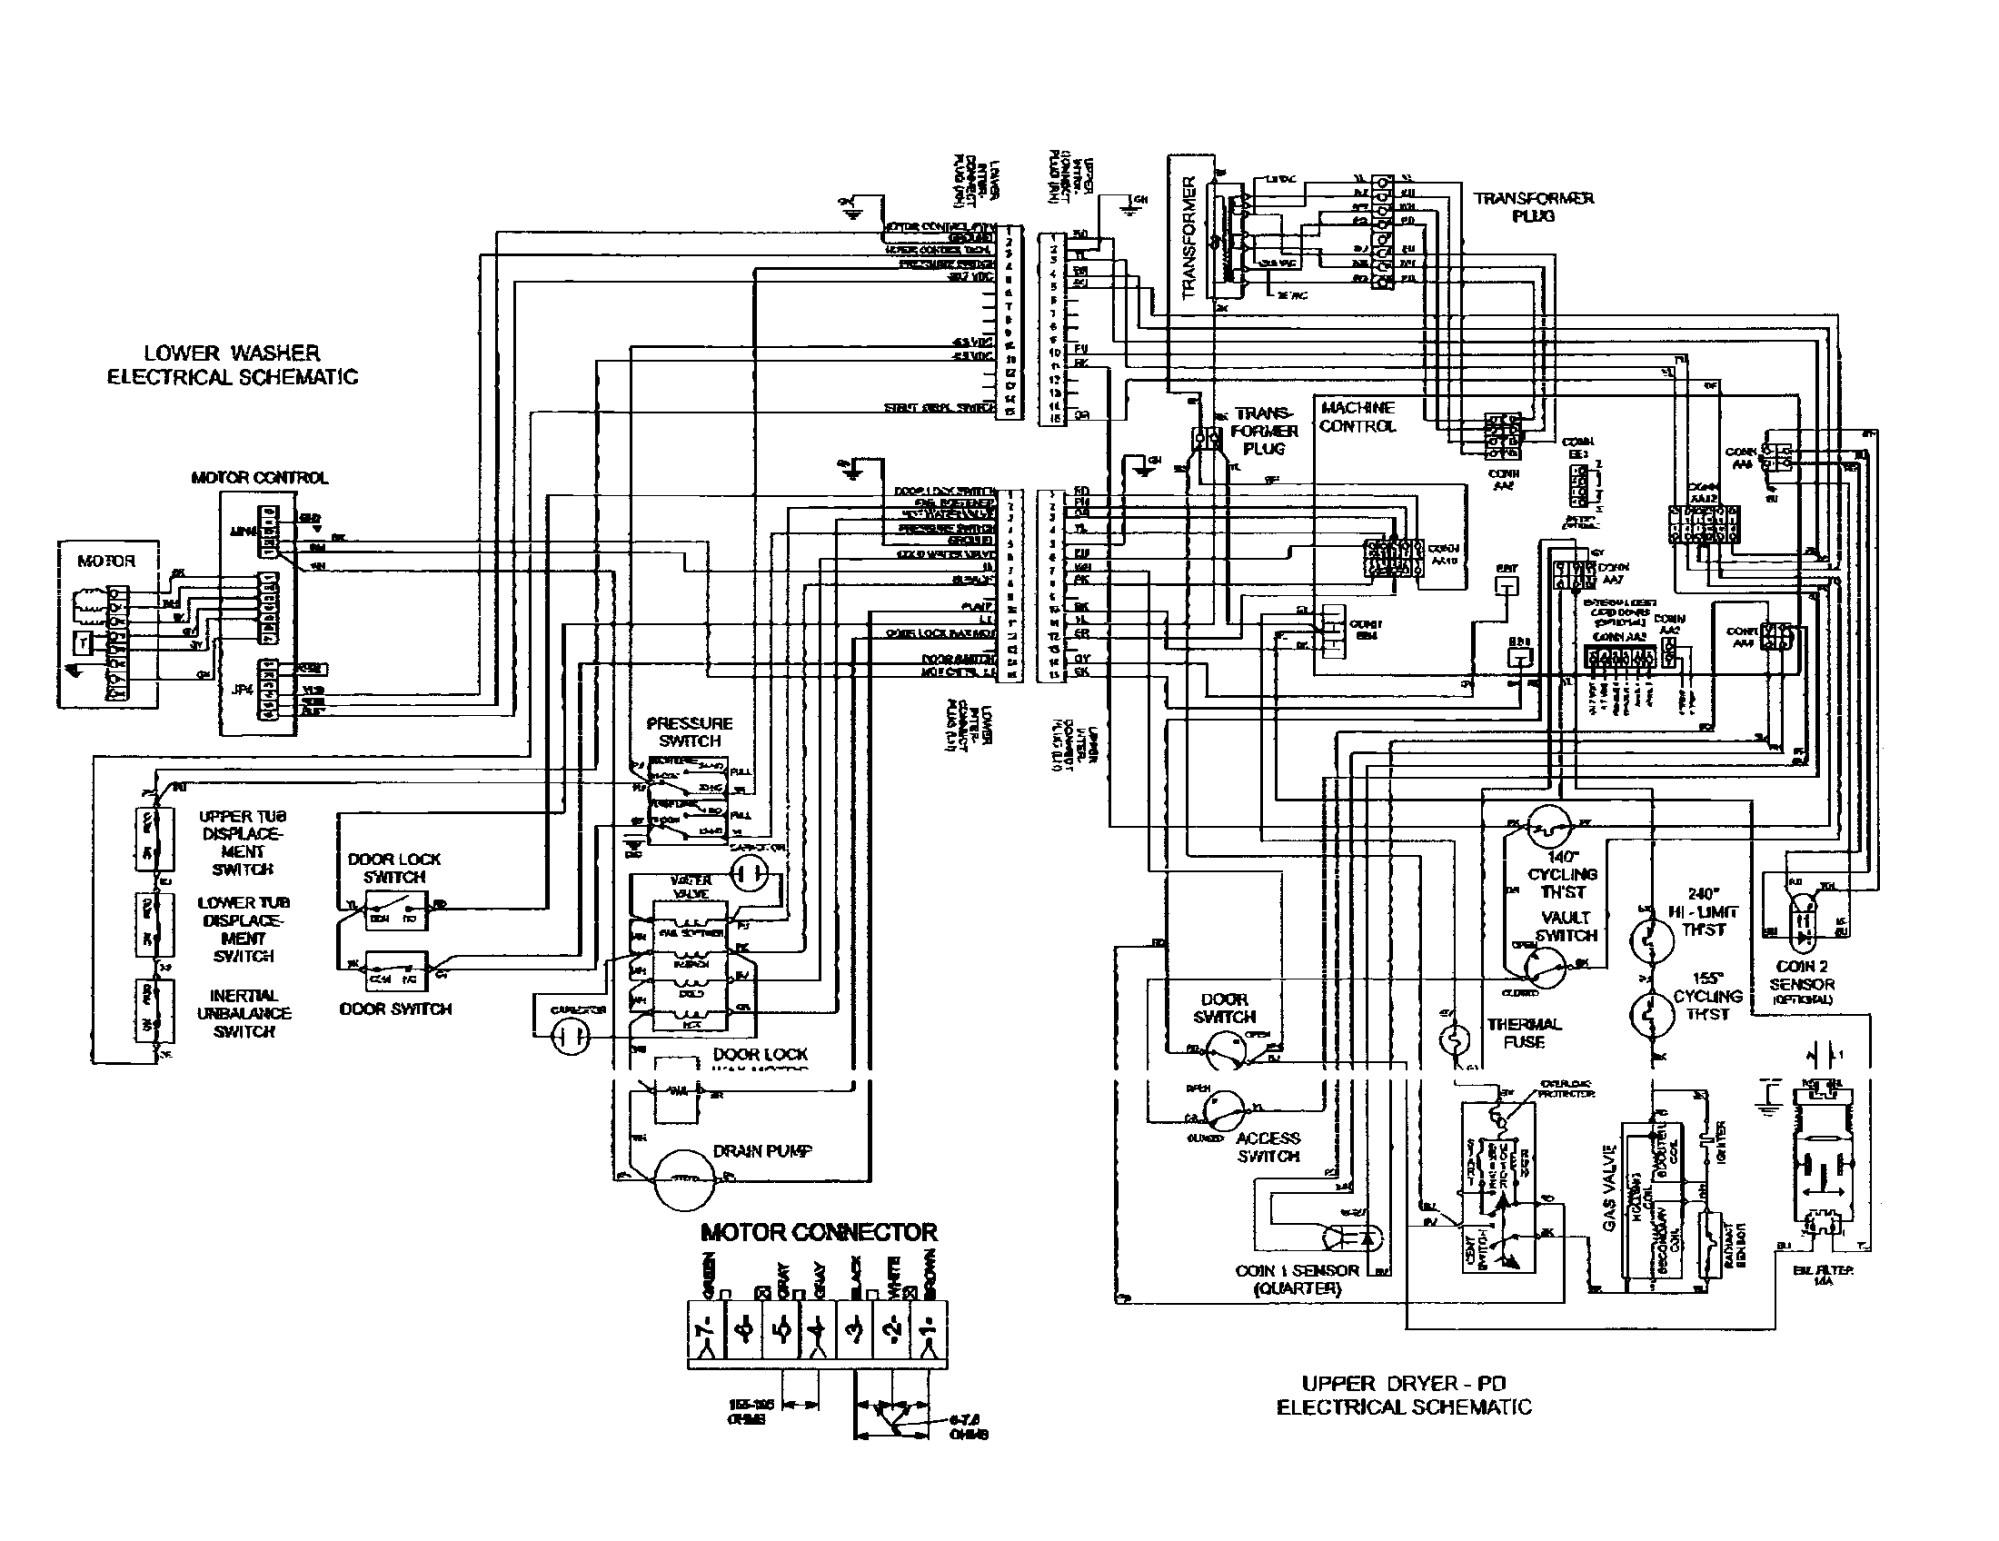 hight resolution of maytag wiring diagram wiring diagram maytag neptune dryer wiring schematic maytag washer wire diagram wiring diagram